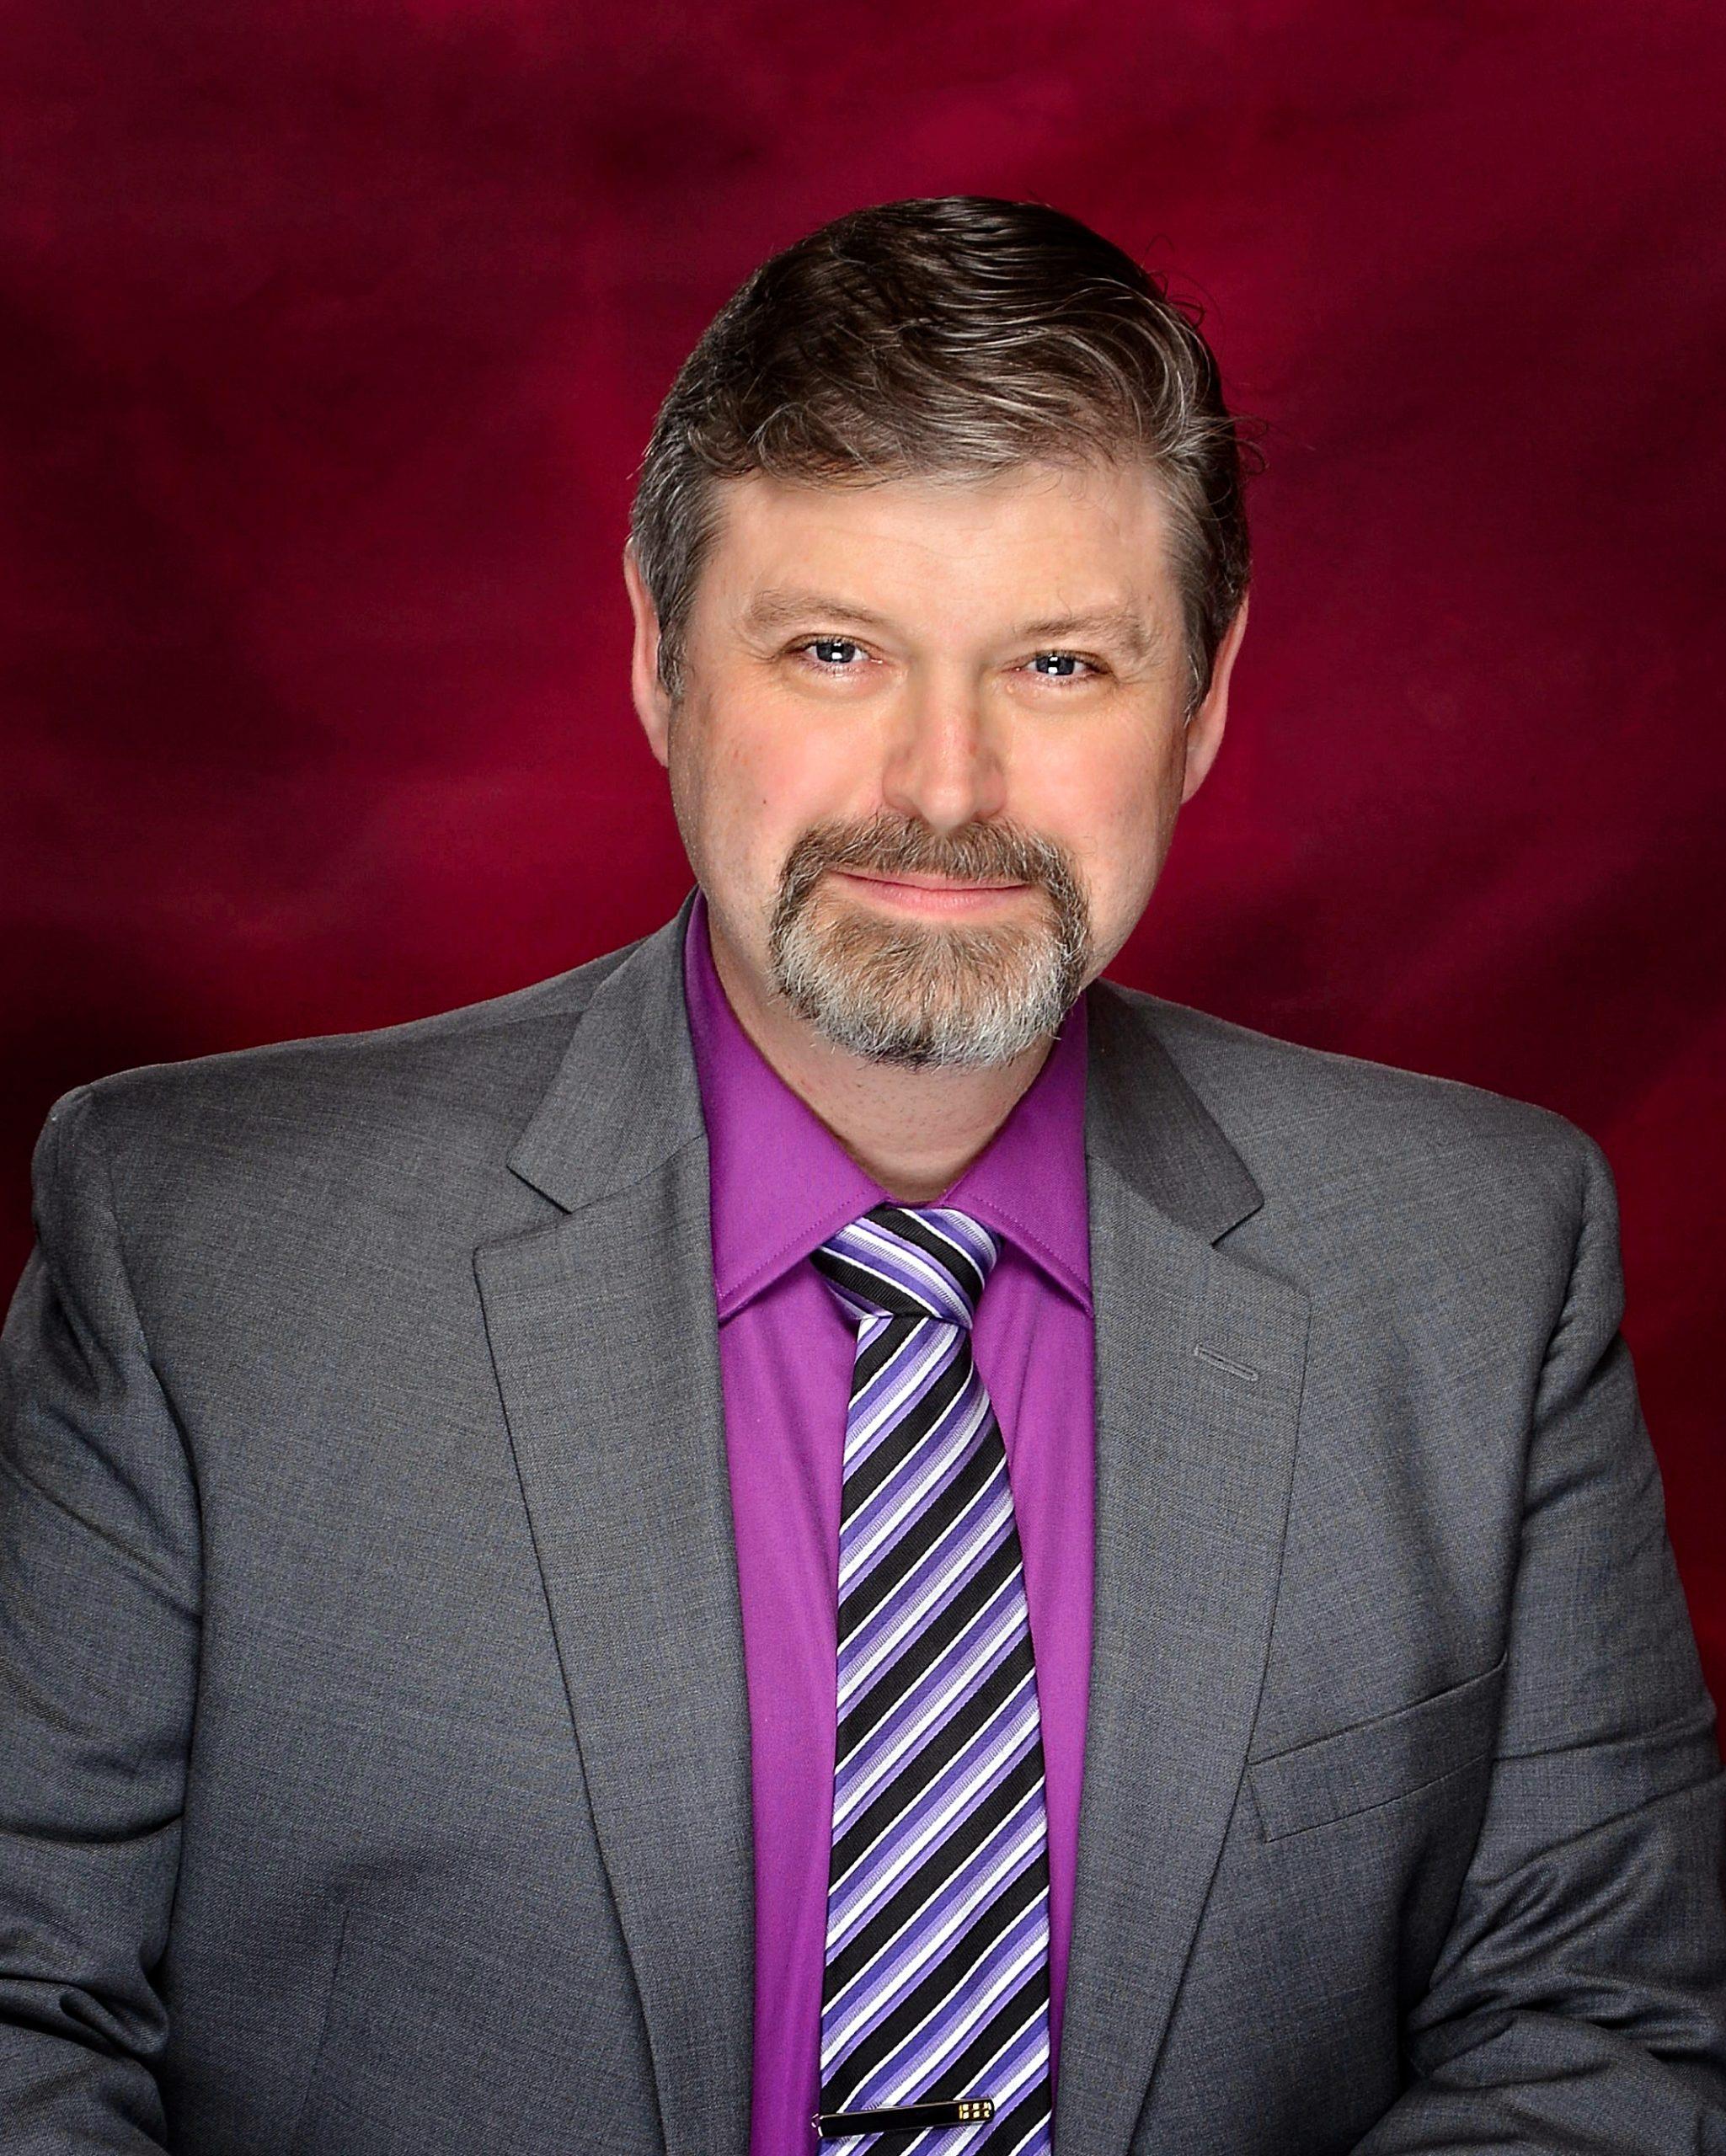 Mr. Reid | Computer Science Teacher